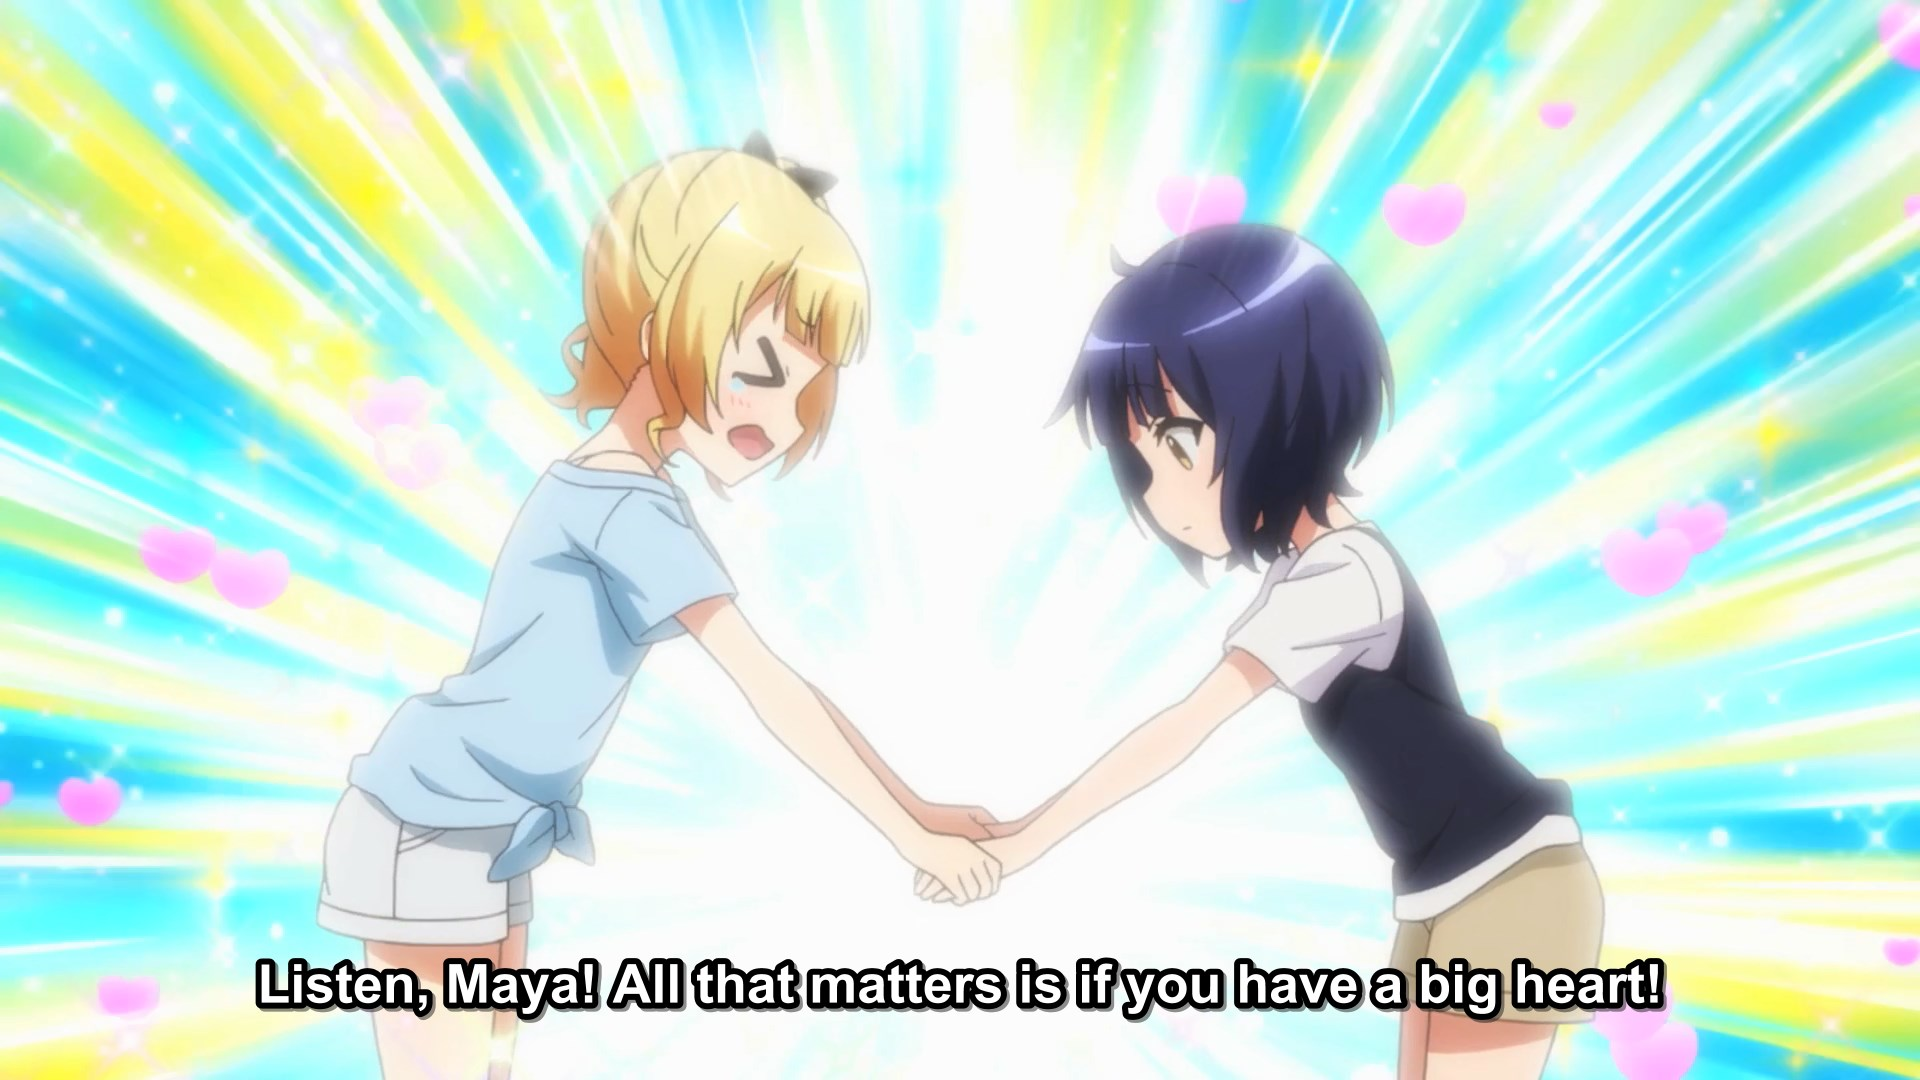 Syaro comforting Maya